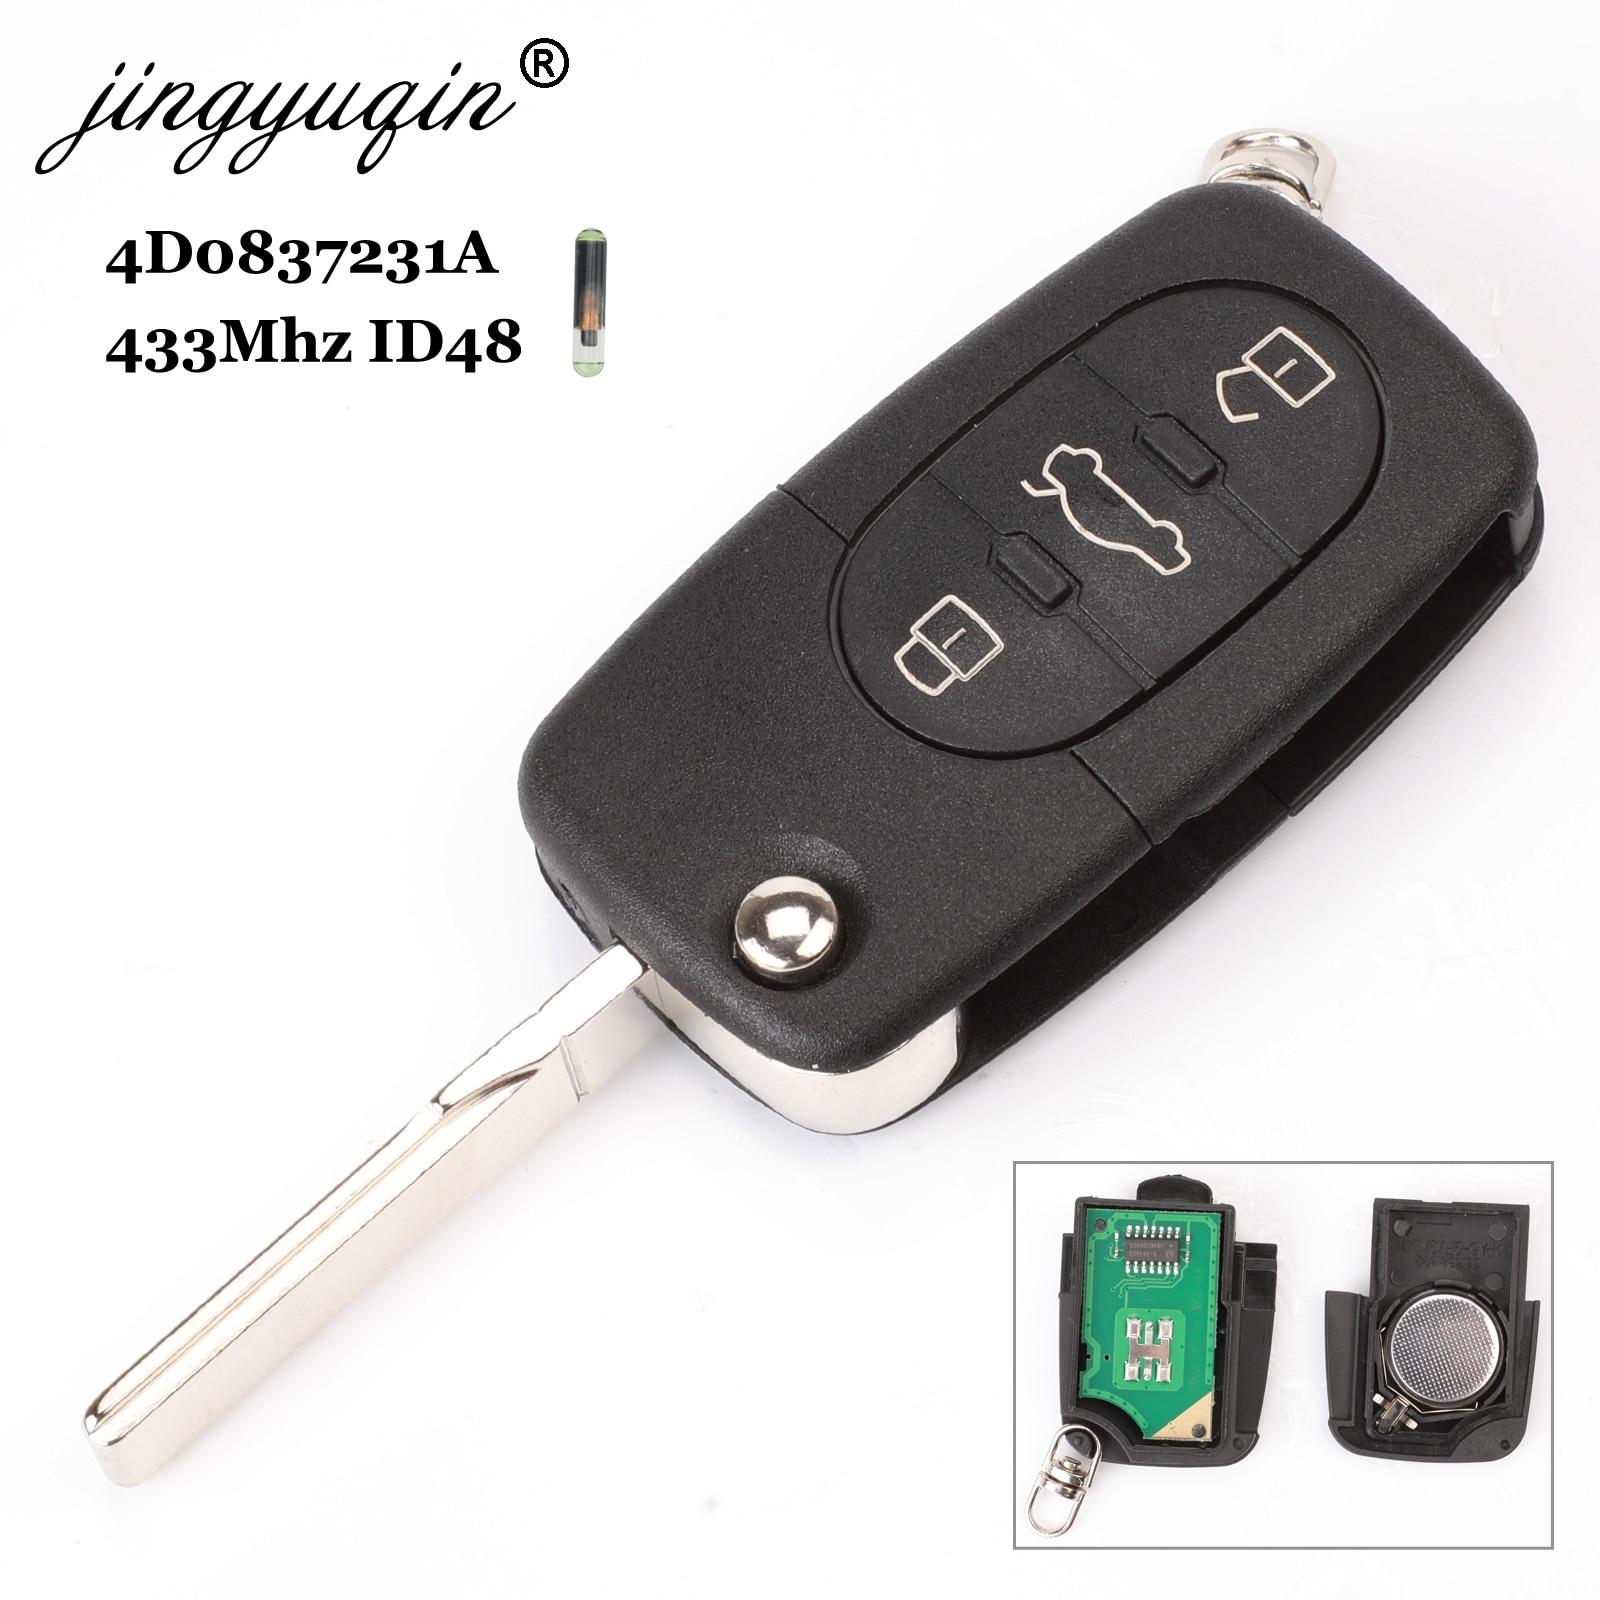 Jingyuqin 4D0837231A 433Mhz ID48 3 Taste Auto Remote Schlüssel für AUDI Flip Falten Chip für A3 A4 A6 A8 alte Modelle